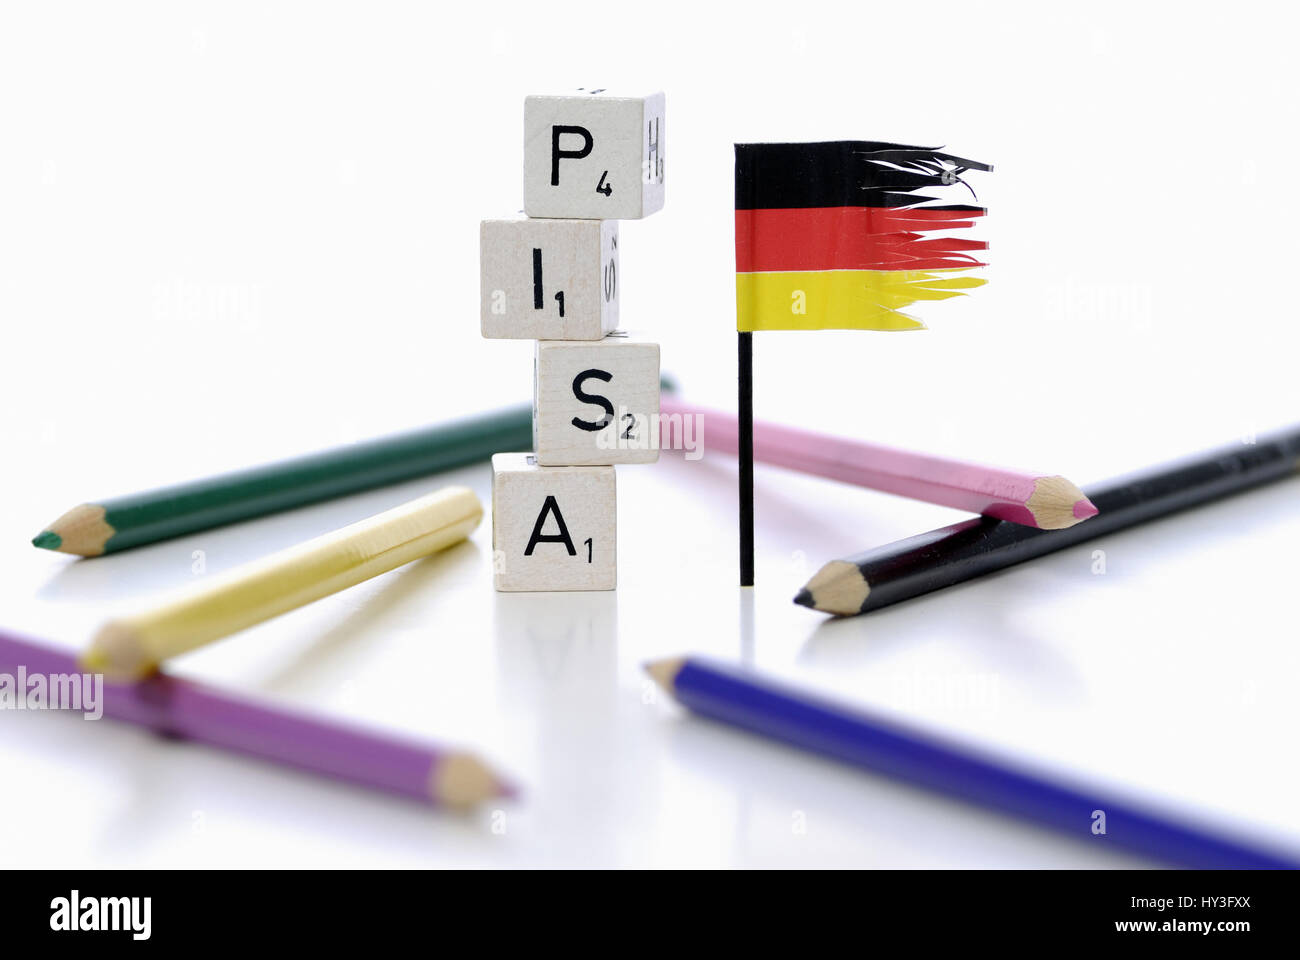 Pisa study, Pisa, study, studies, Germany, badly, education, educational plight, school, schools, bad, bad, stupidly, silly, Sch¸ler, educational term Stock Photo